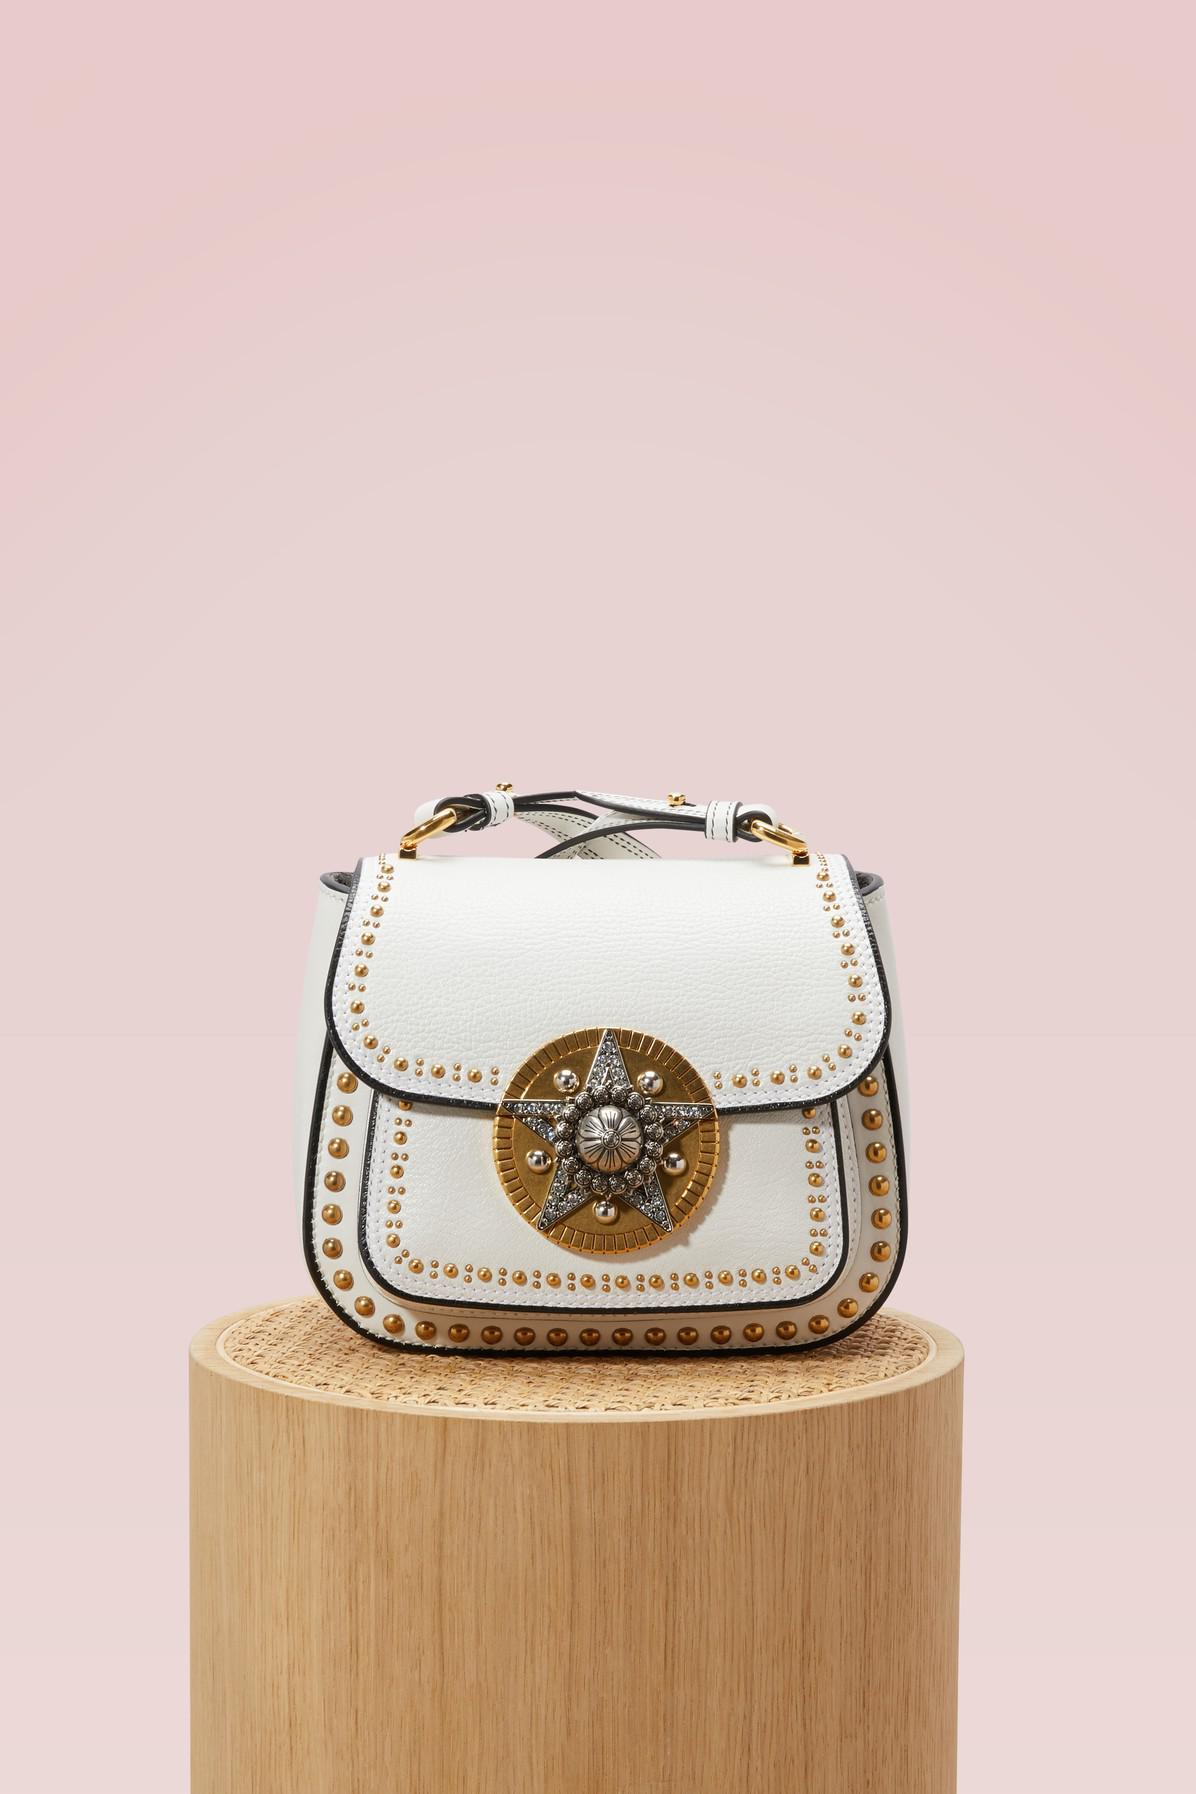 3f9f5b2e66e5 Miu Miu Dahlia Star Leather Crossbody Bag in White - Lyst